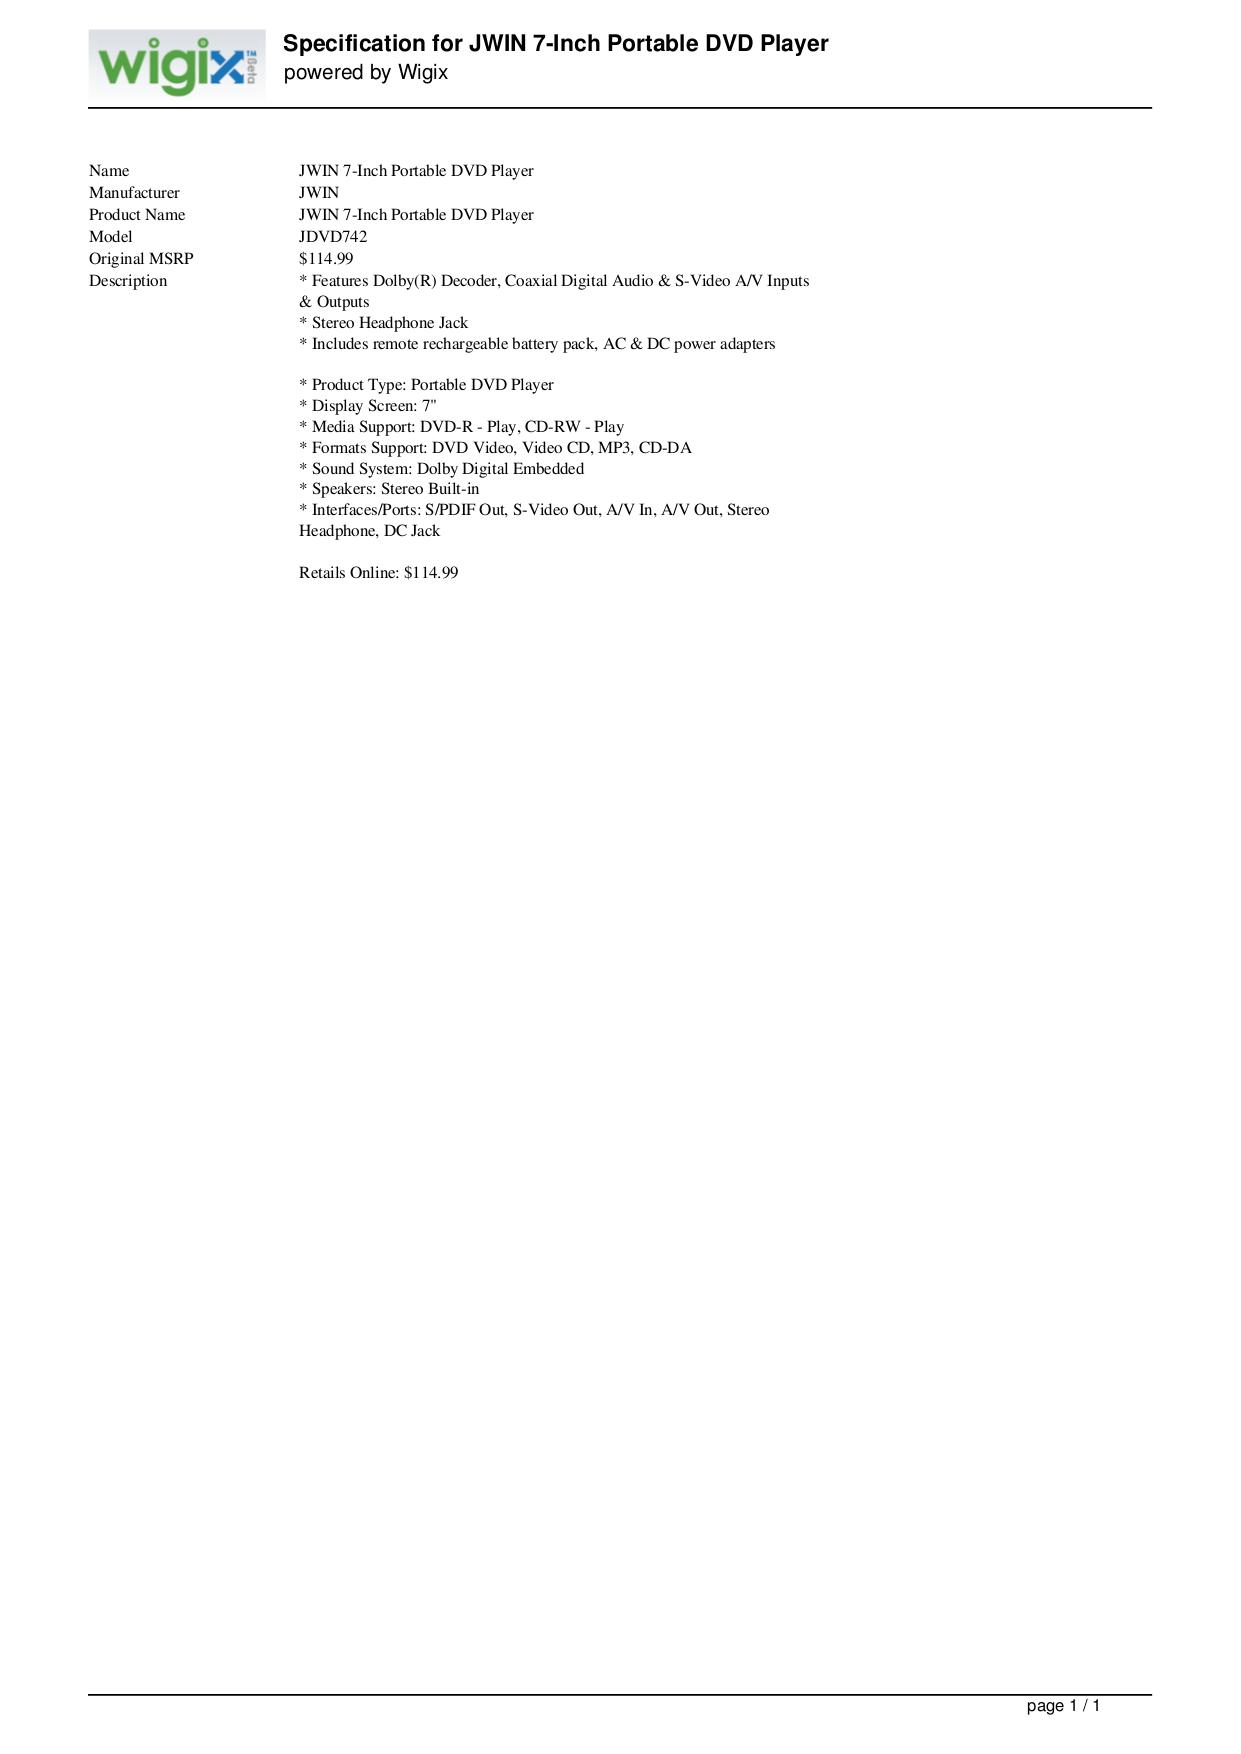 pdf for jWIN Portable DVD Player JD-VD742 manual